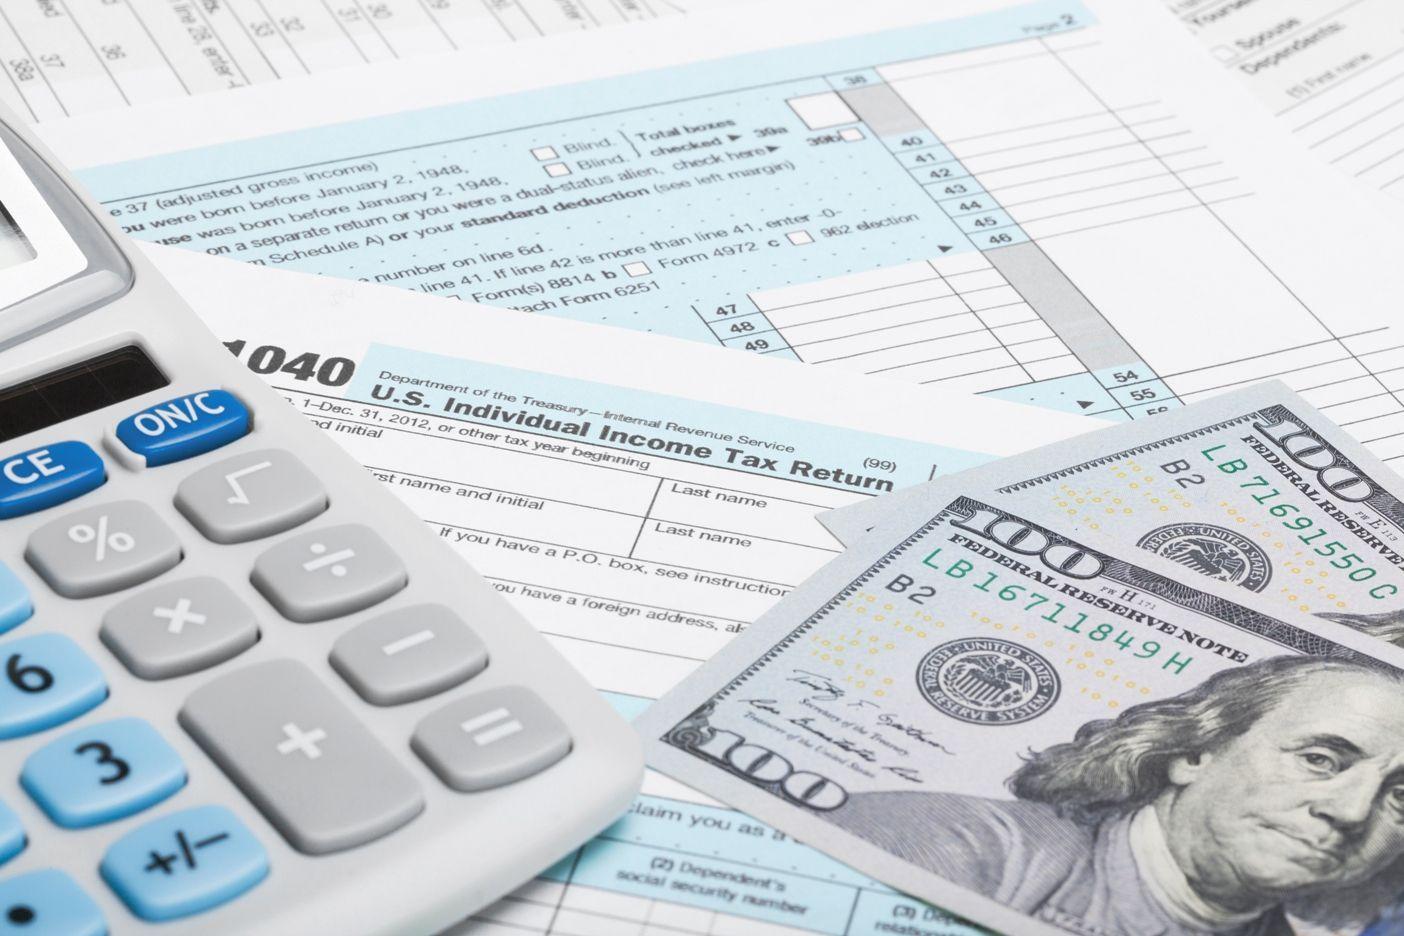 Cancellation of Debt: Form 1099-C | Credit repair, Credit ...